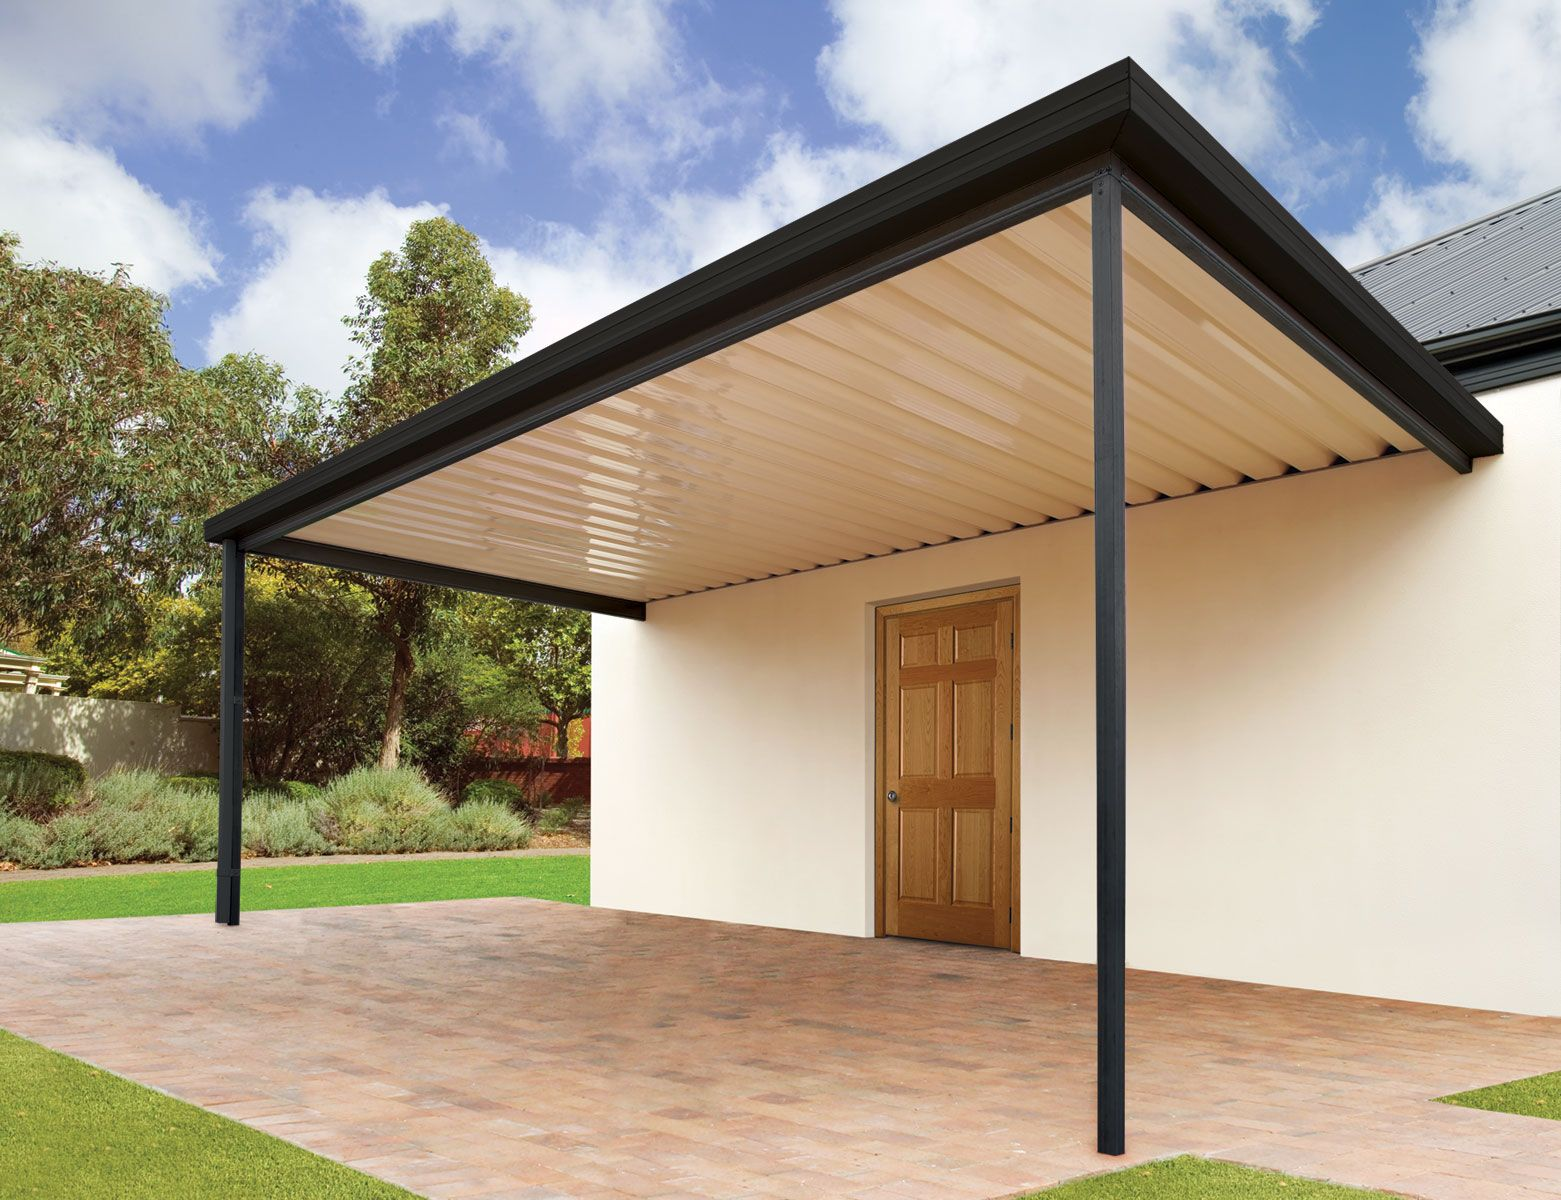 Sanctuary® Patio Stratco Carport patio, Patio, Patio kits